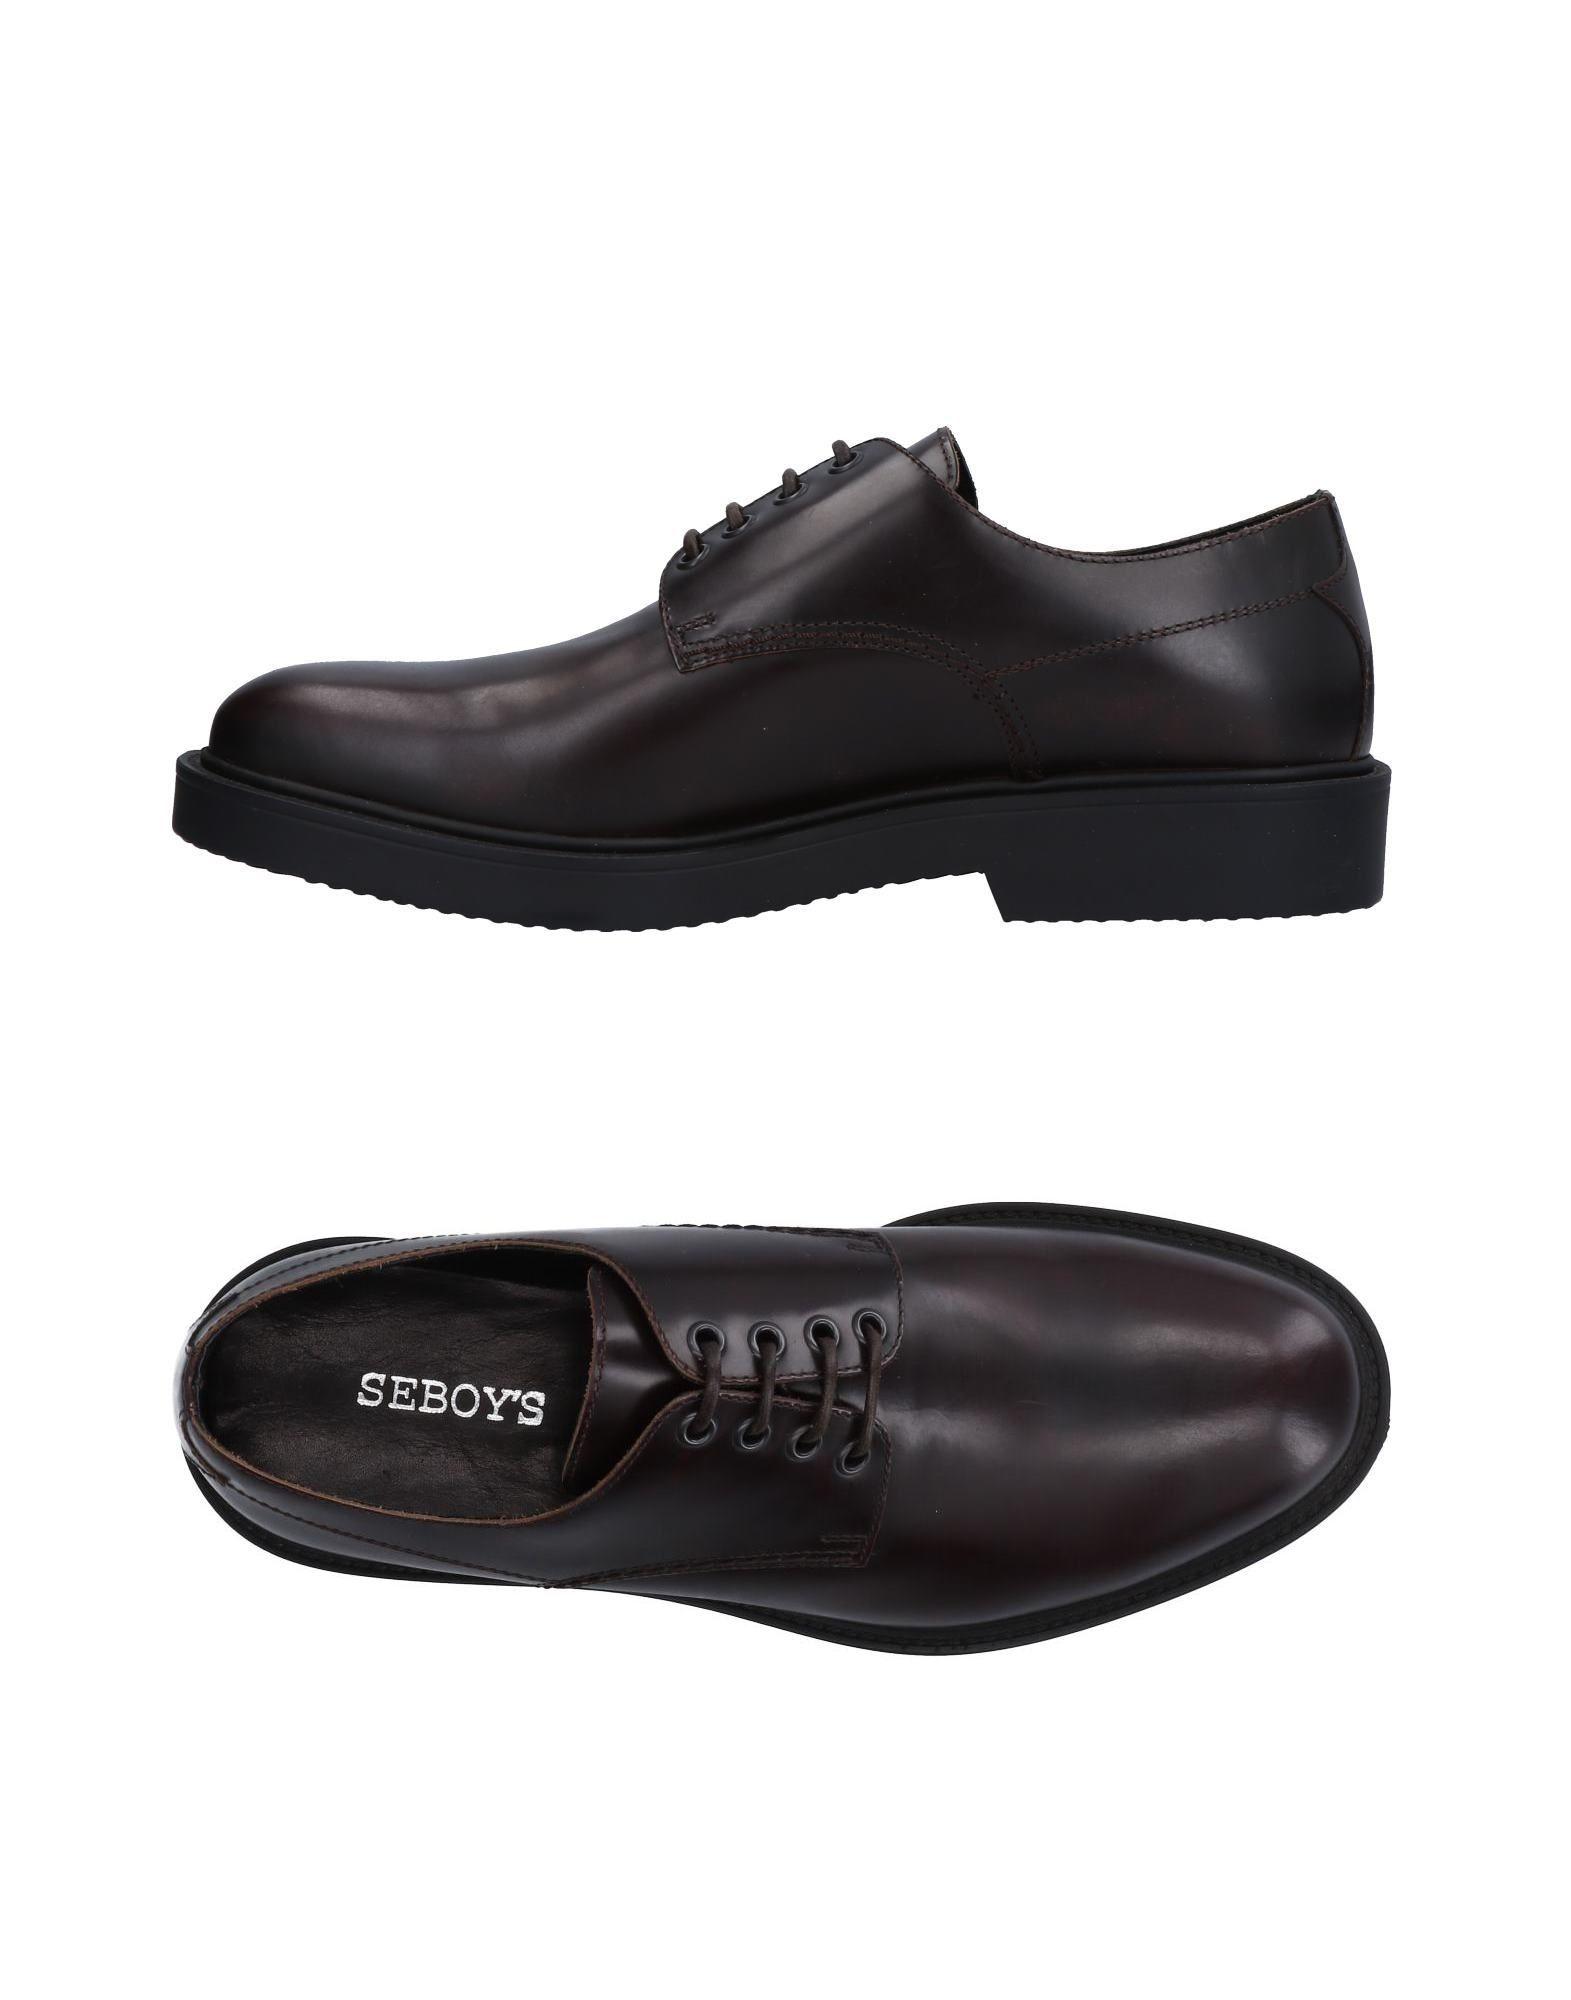 SEBOYS Laced Shoes in Dark Brown